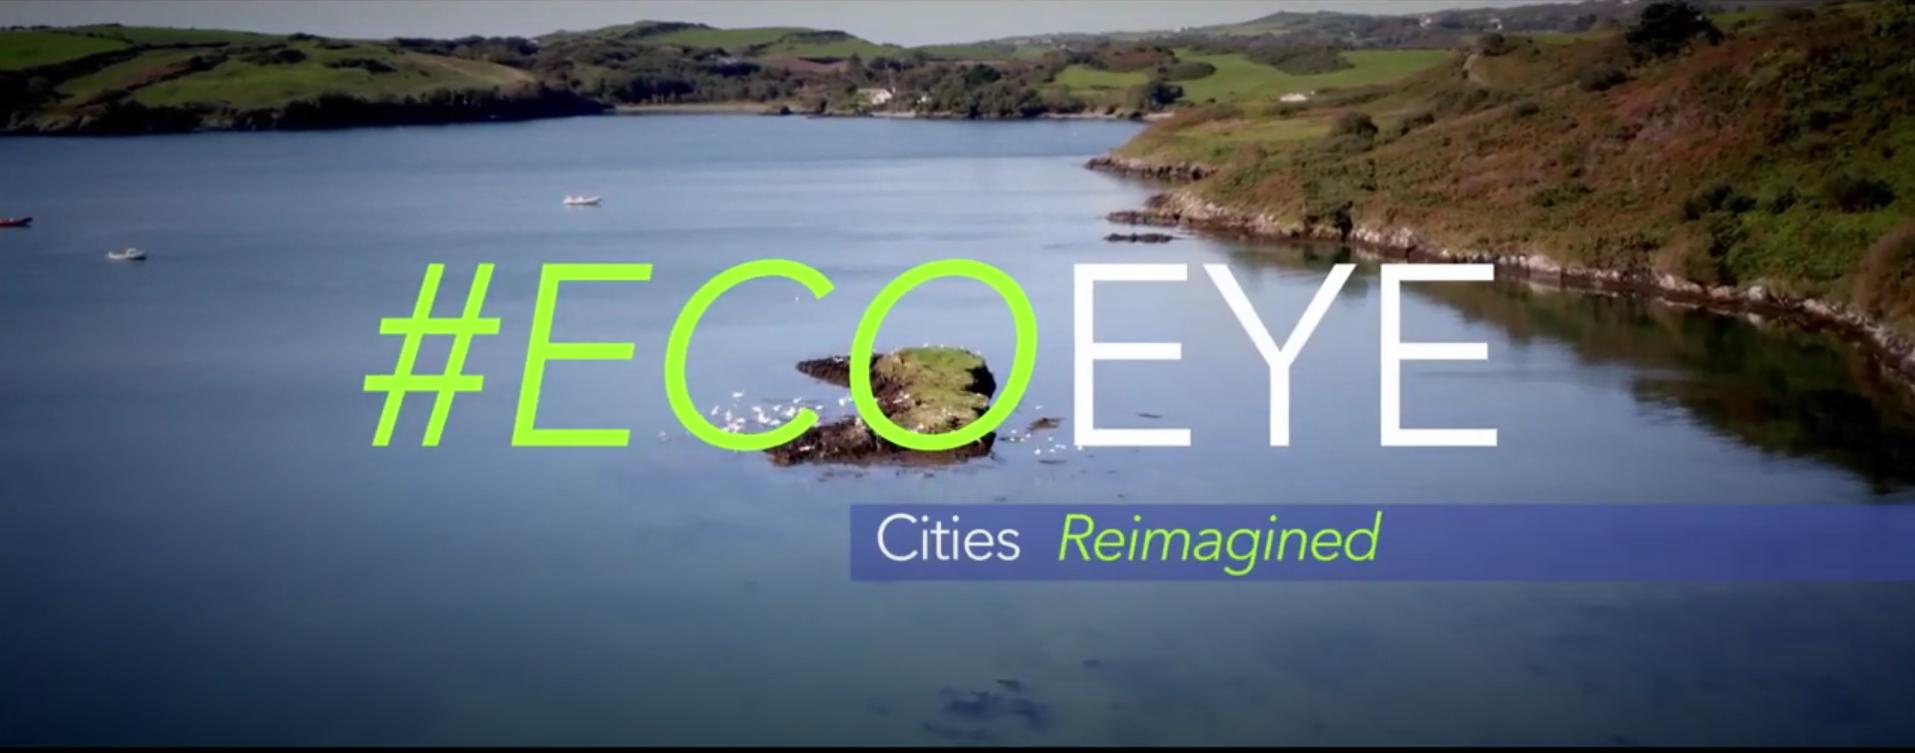 Eco Eye Cities Reimagined